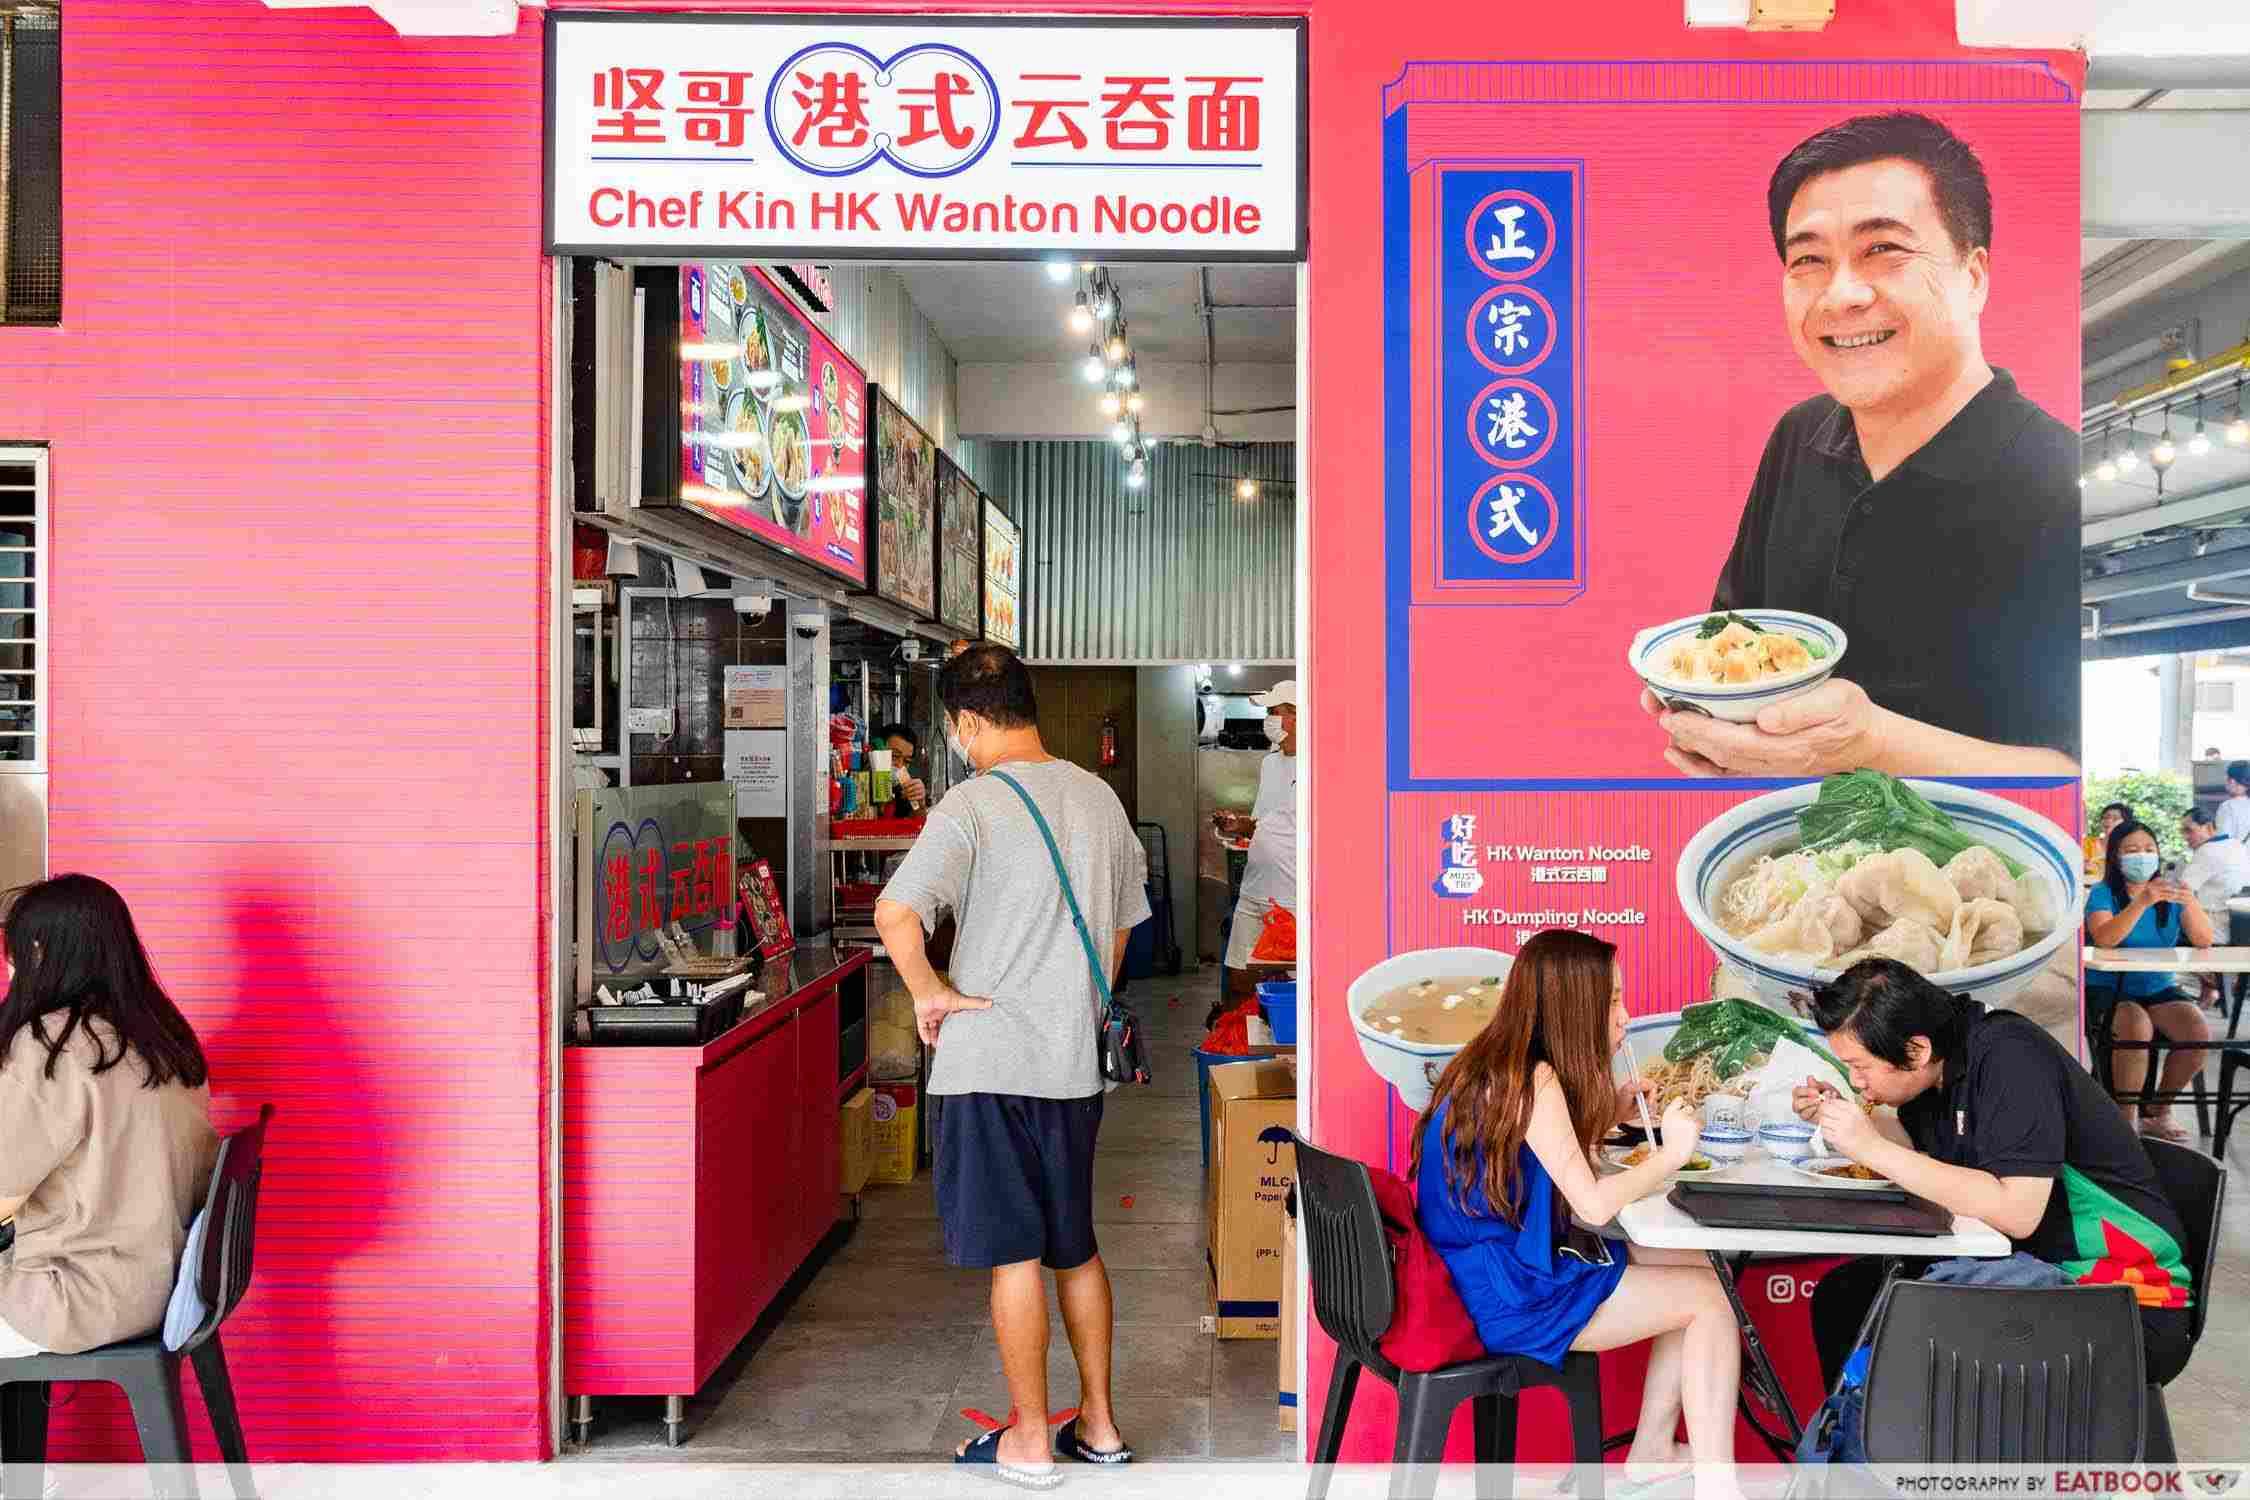 chef kin hk wanton noodle ambience